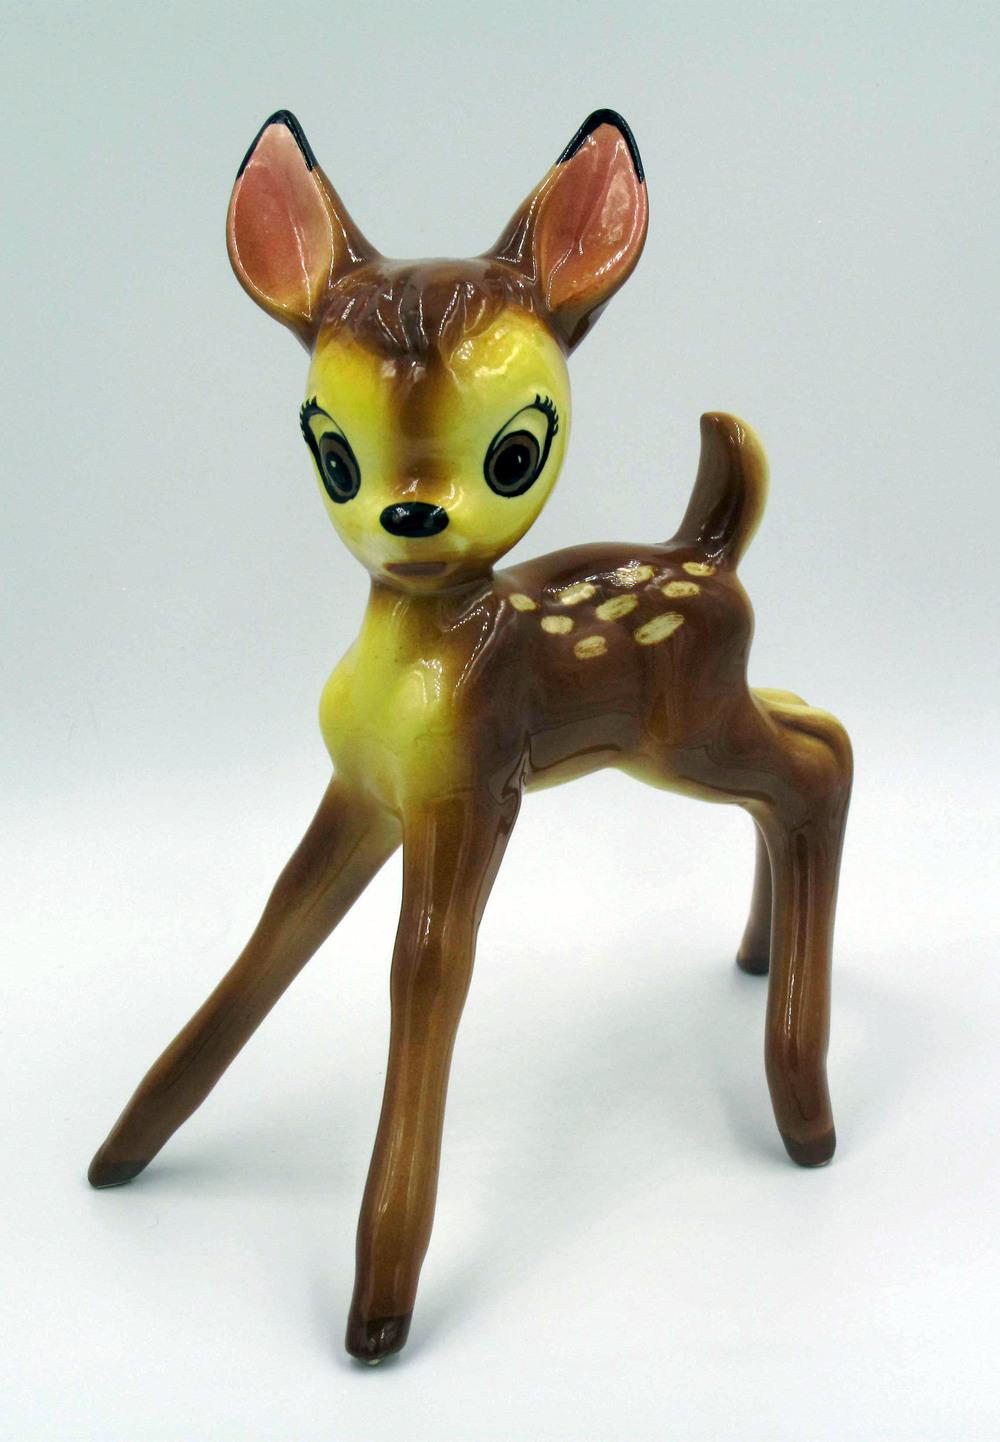 Bambi - One Alert